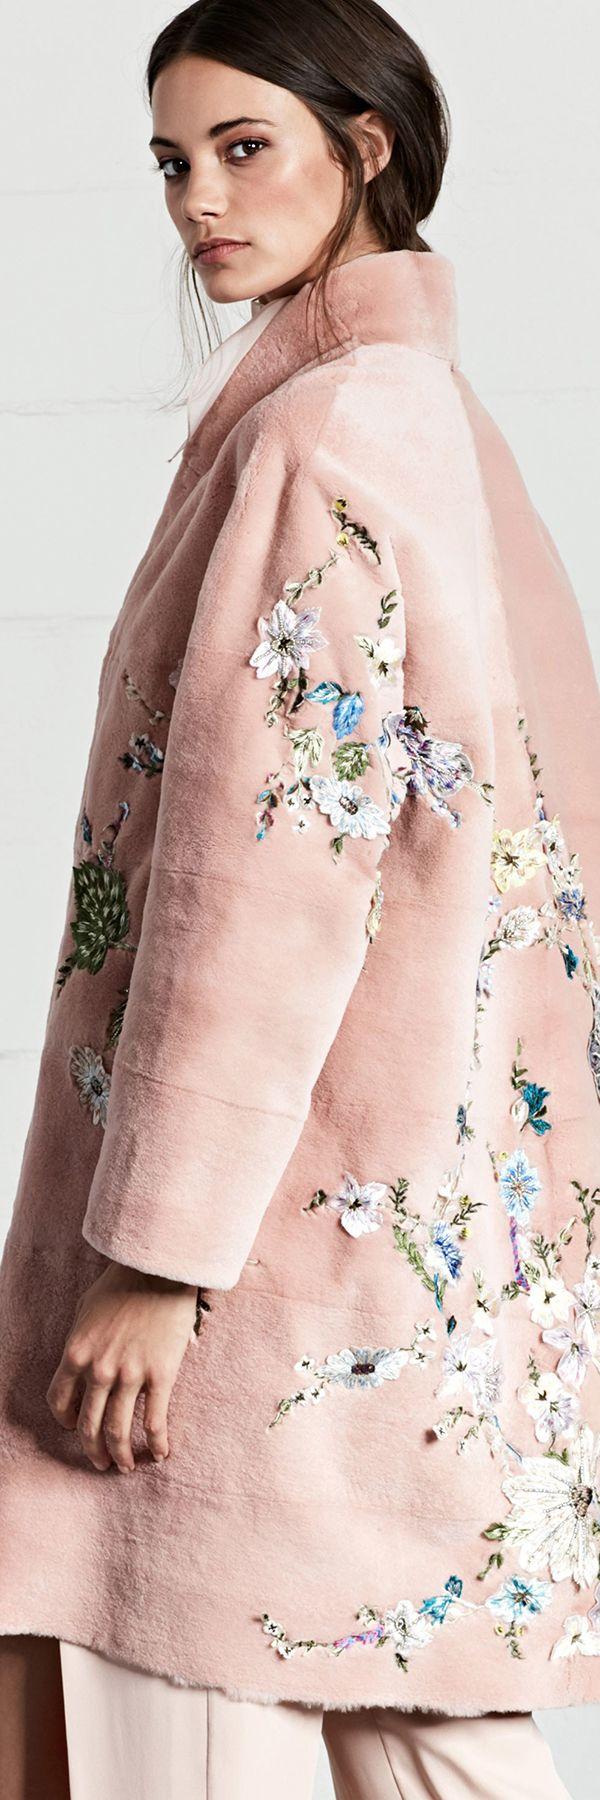 Dennis Basso Resort 2018 Collection | Abrigos, trenchs, Dress coats ...